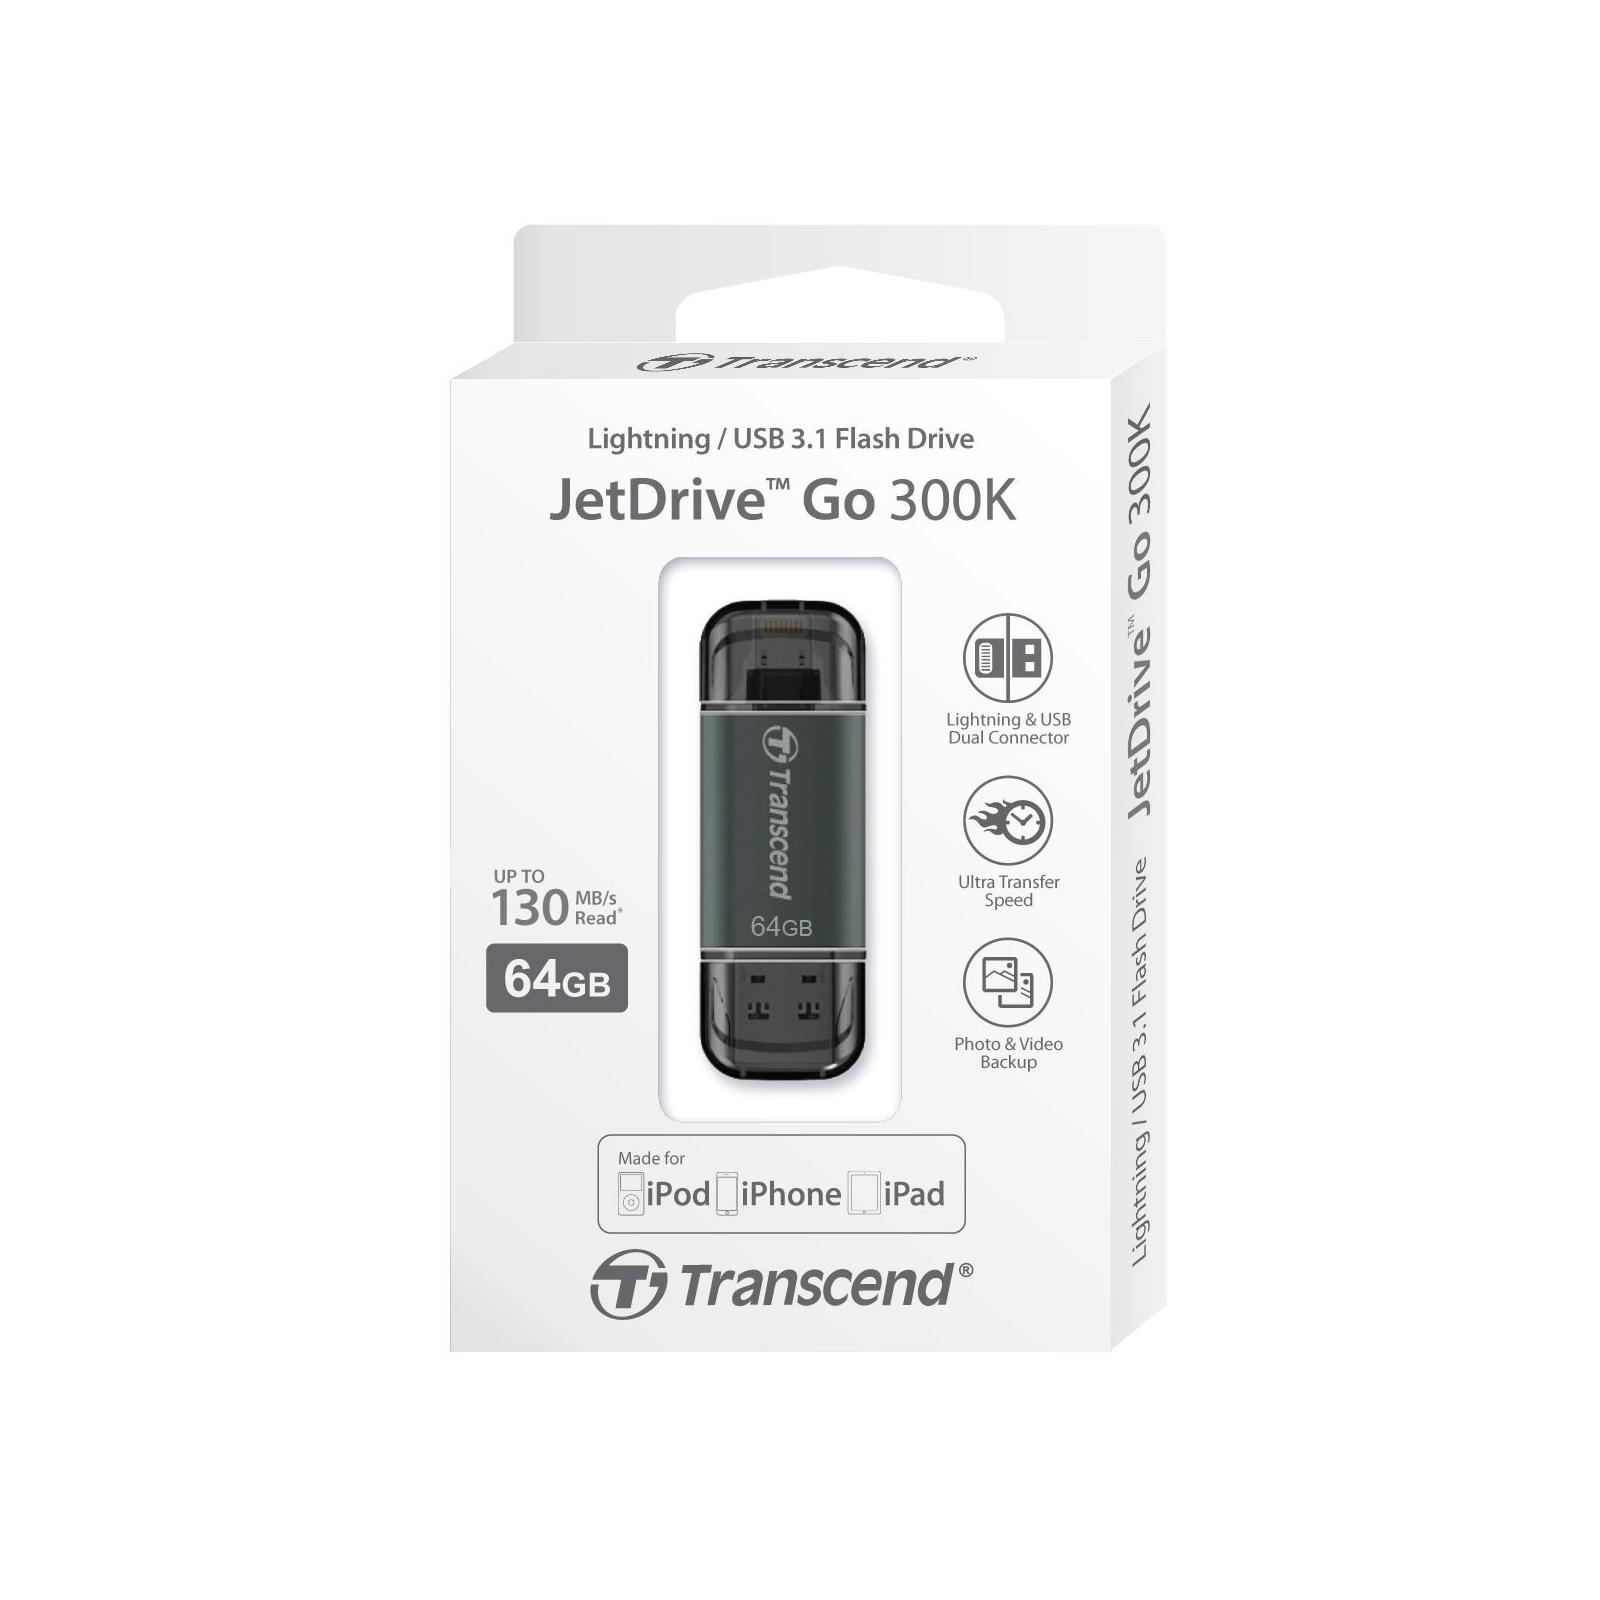 USB флеш накопитель Transcend 64GB JetDrive Go 300 Black USB 3.1 (TS64GJDG300K) изображение 5